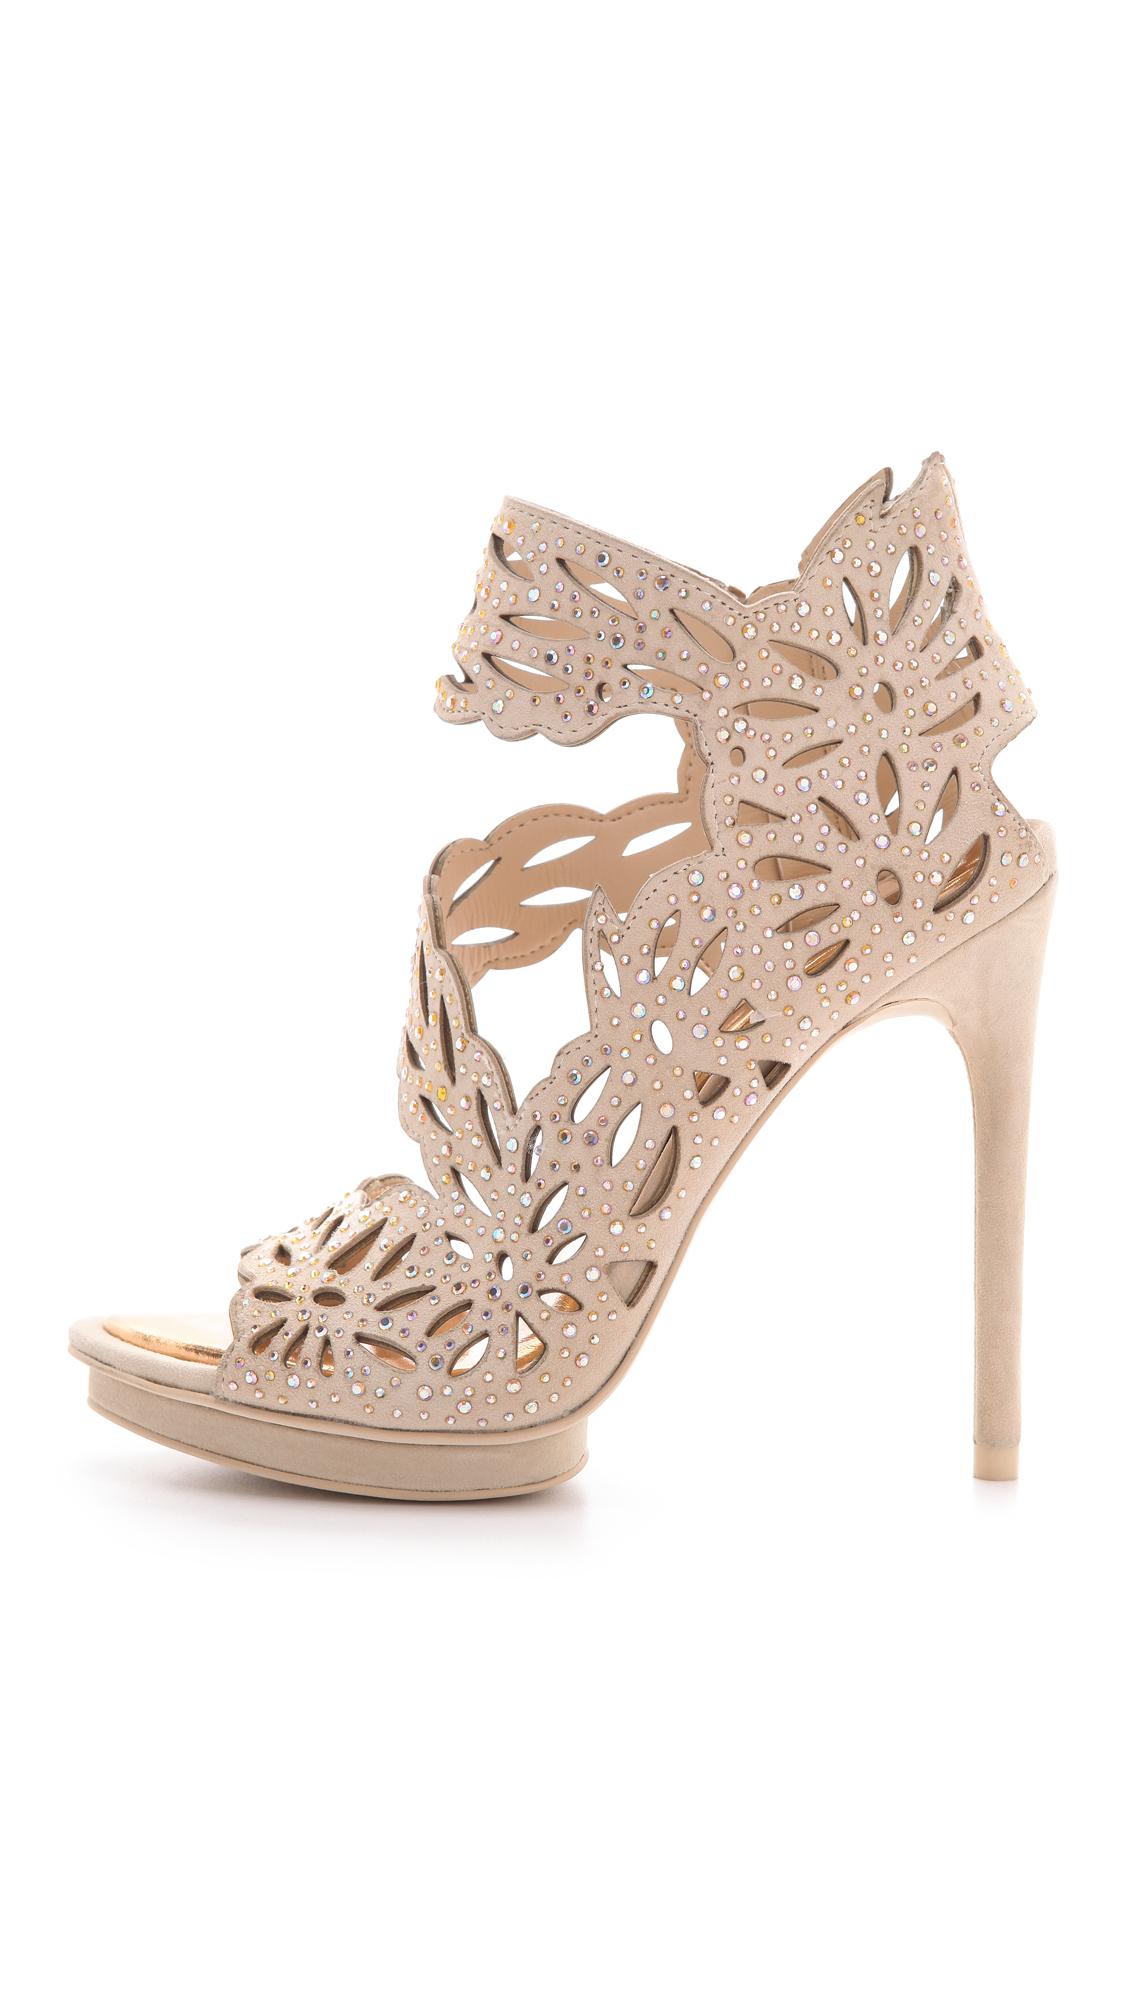 Bcbgmaxazria Faricia Suede Sandals In Natural Lyst